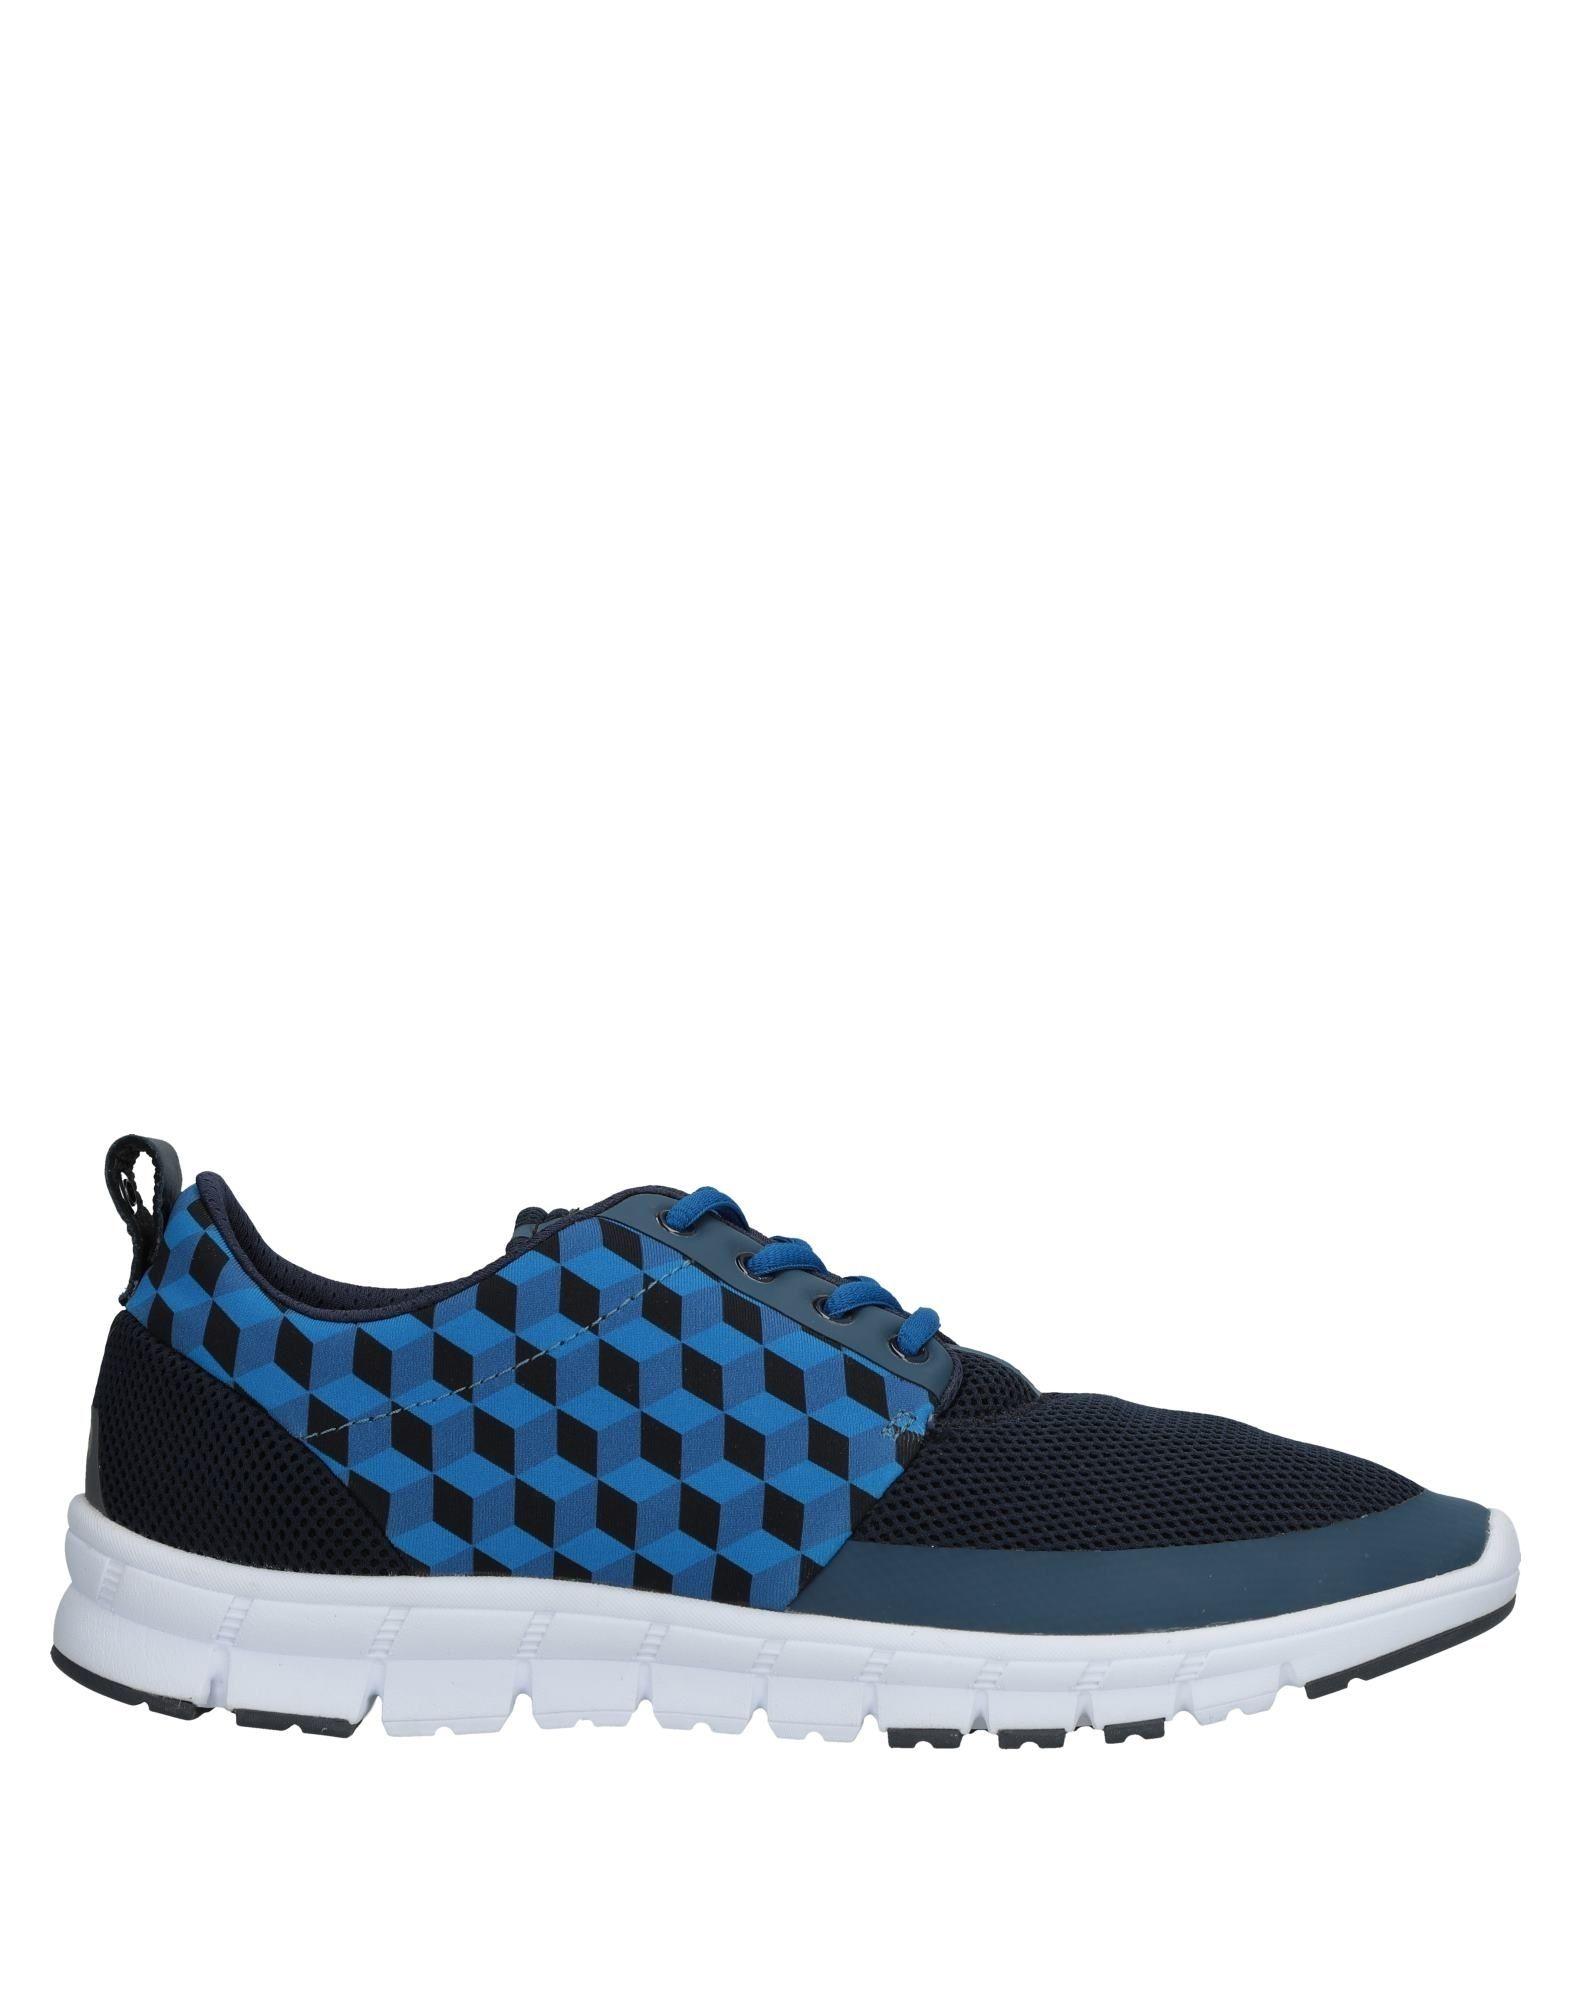 Sneakers Moa Master Uomo Of Arts Uomo Master - 11524230FF ff1771